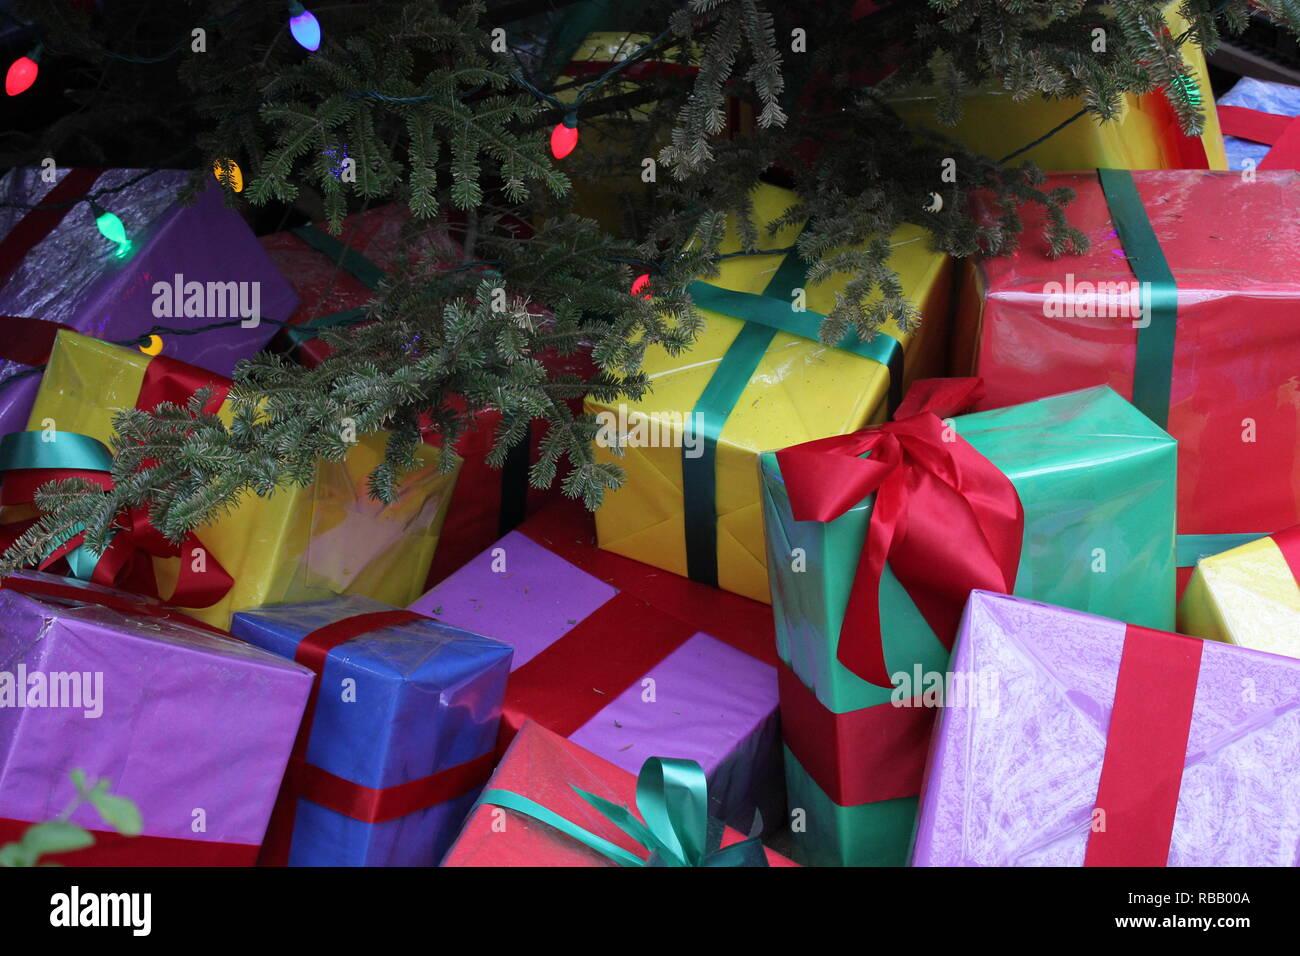 Weihnachtsfeiertag Flower Show am Lincoln Park Conservatory in Chicago, Illinois, USA. Stockbild